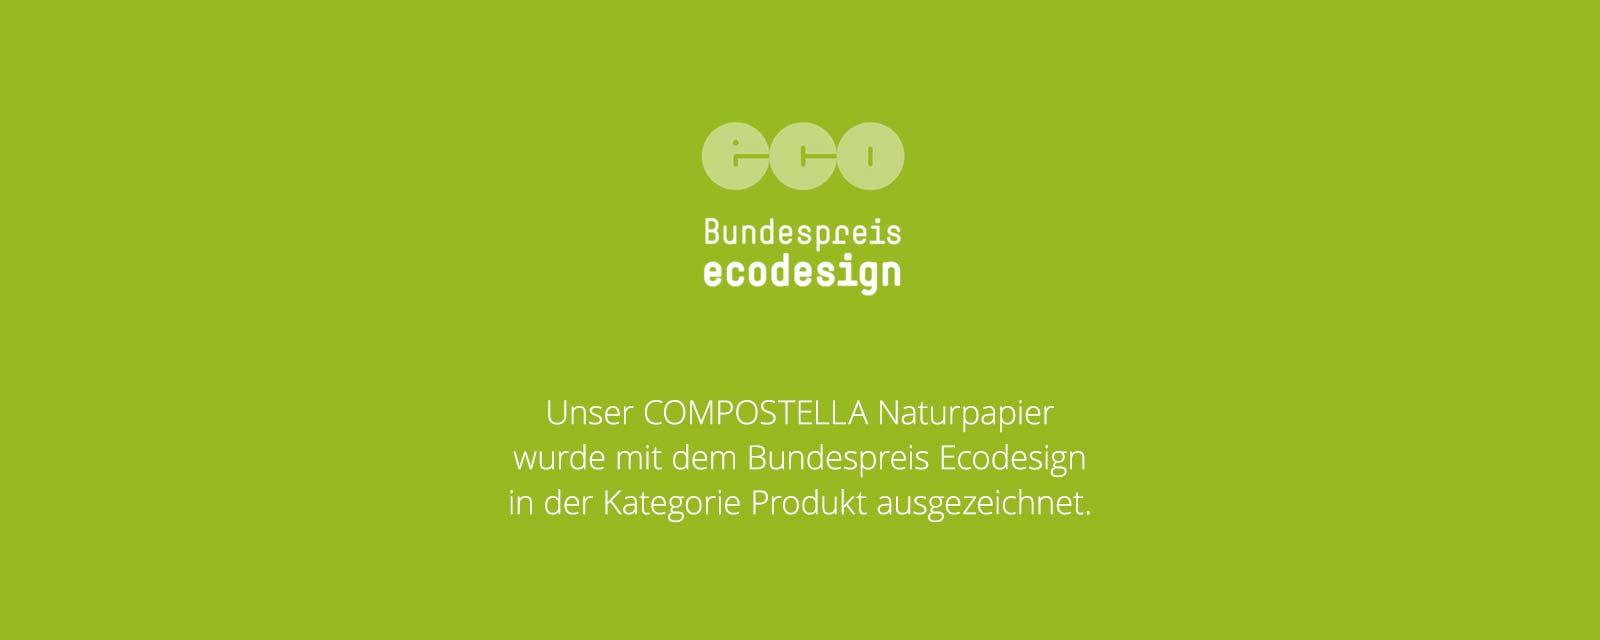 compostella bundespreis ecodesign2018